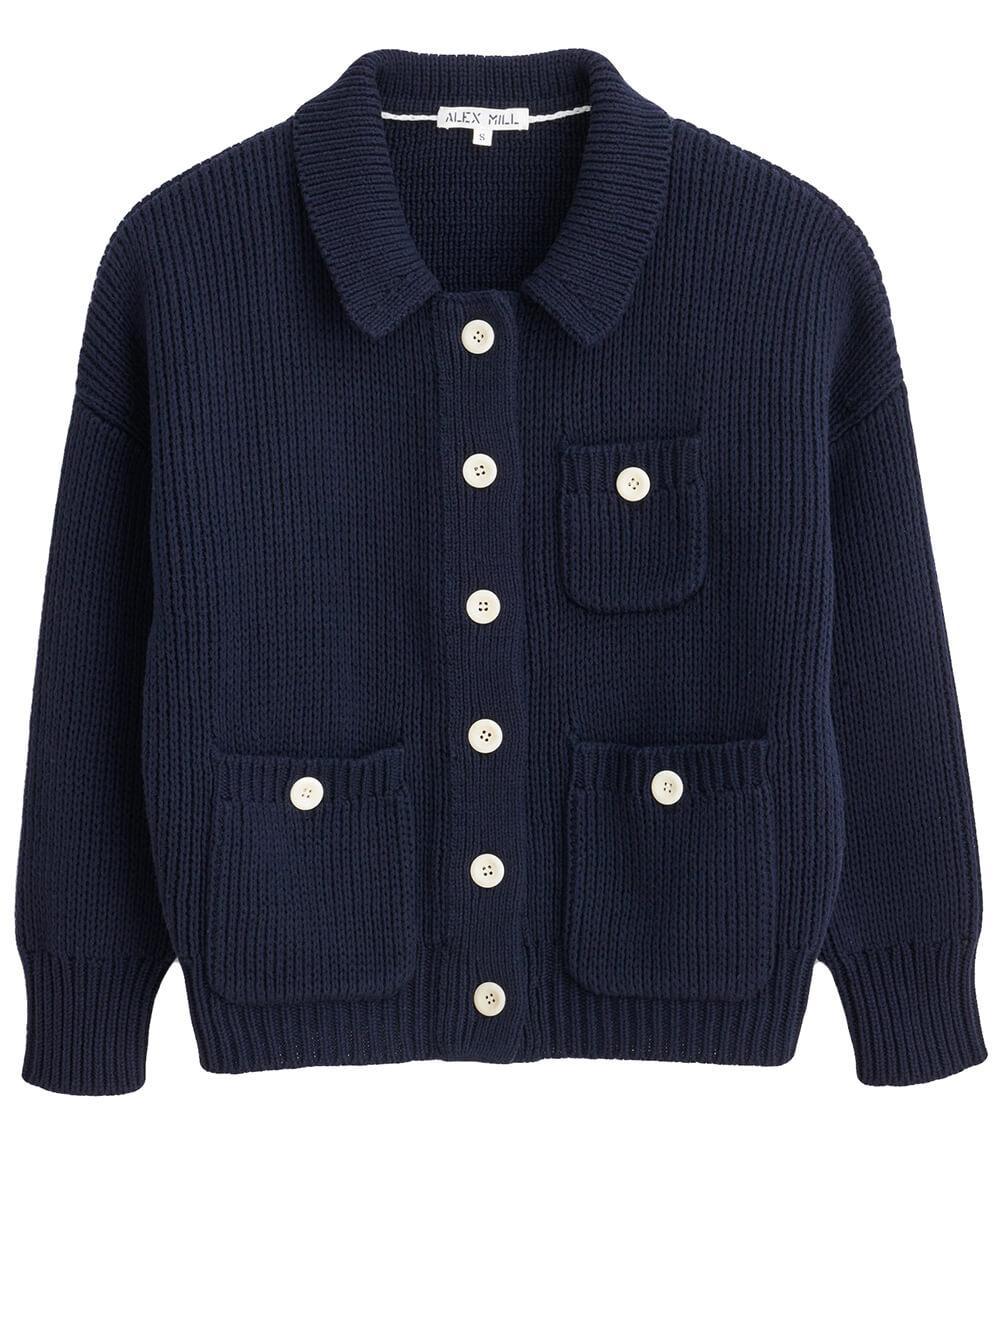 Work Sweater Jacket